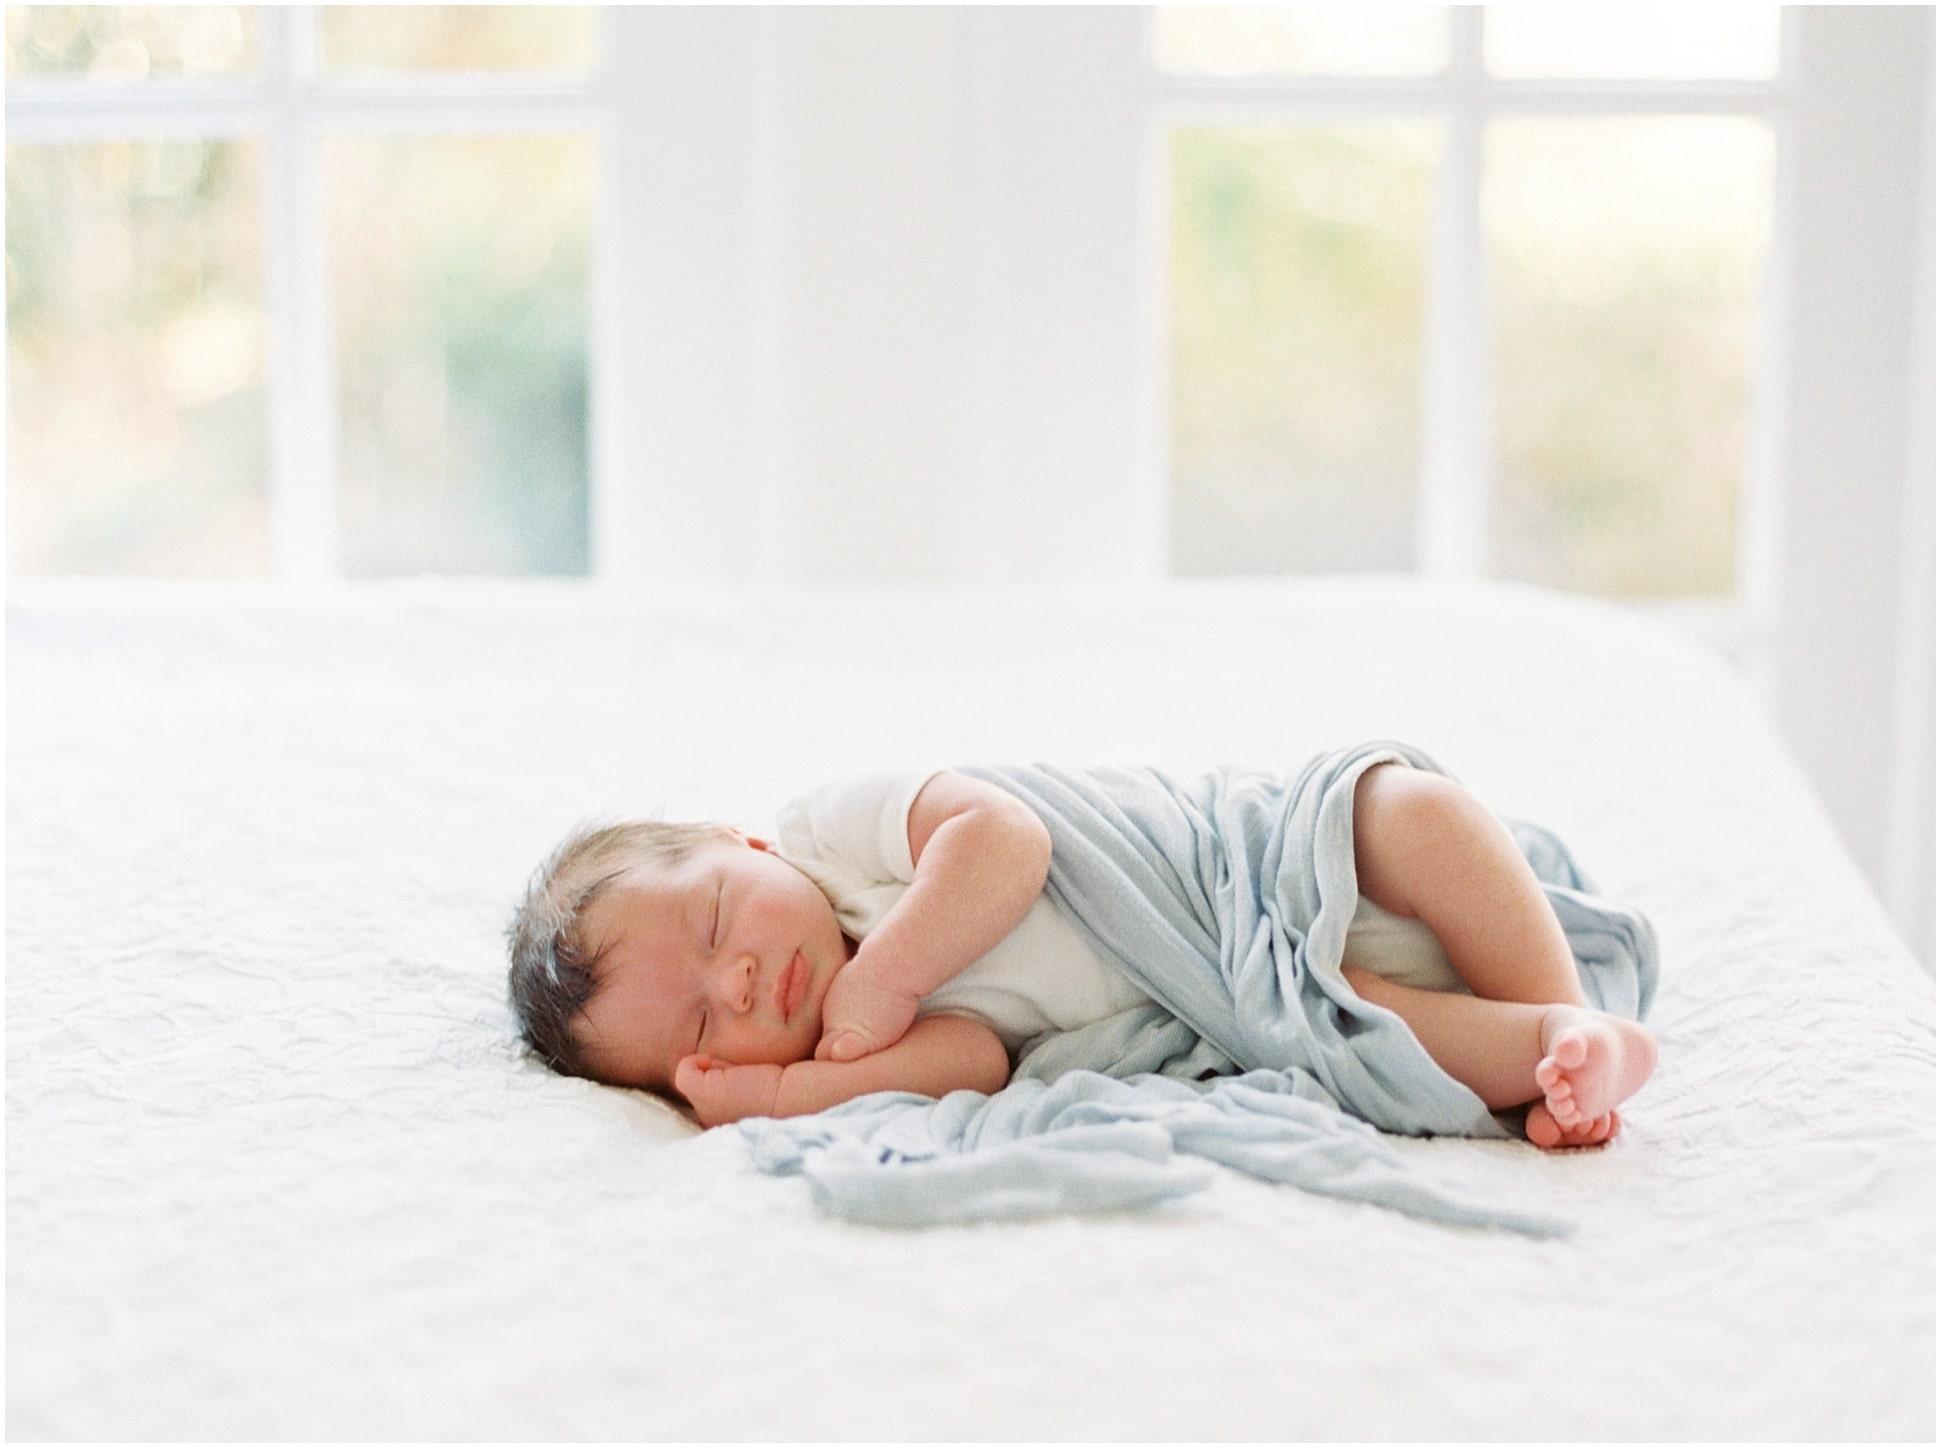 newborn baby boy portrait on white backdrop